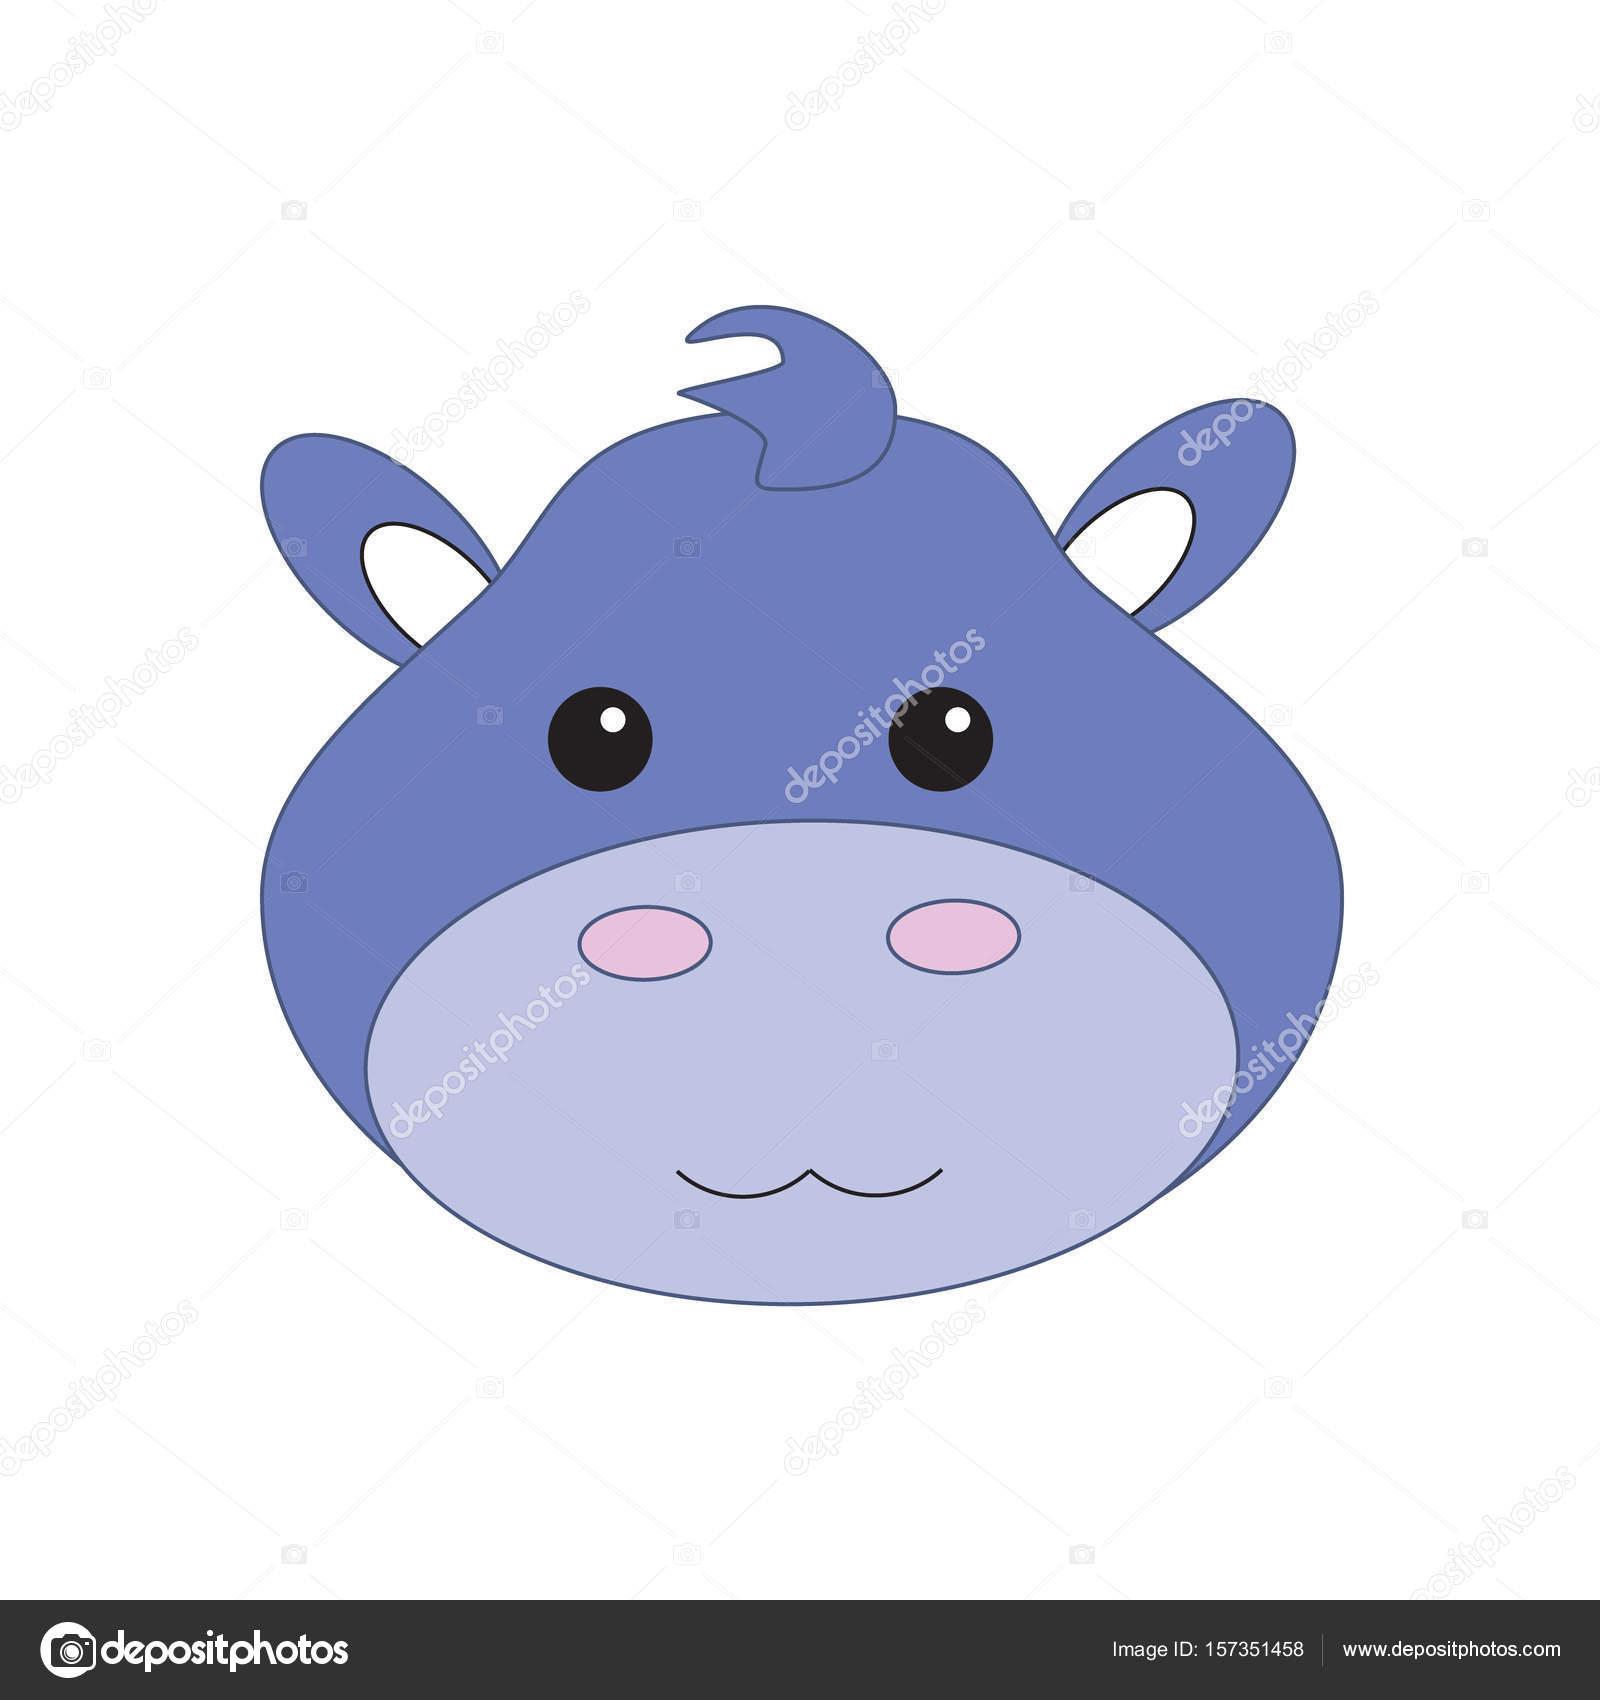 hippo face template - 600×600